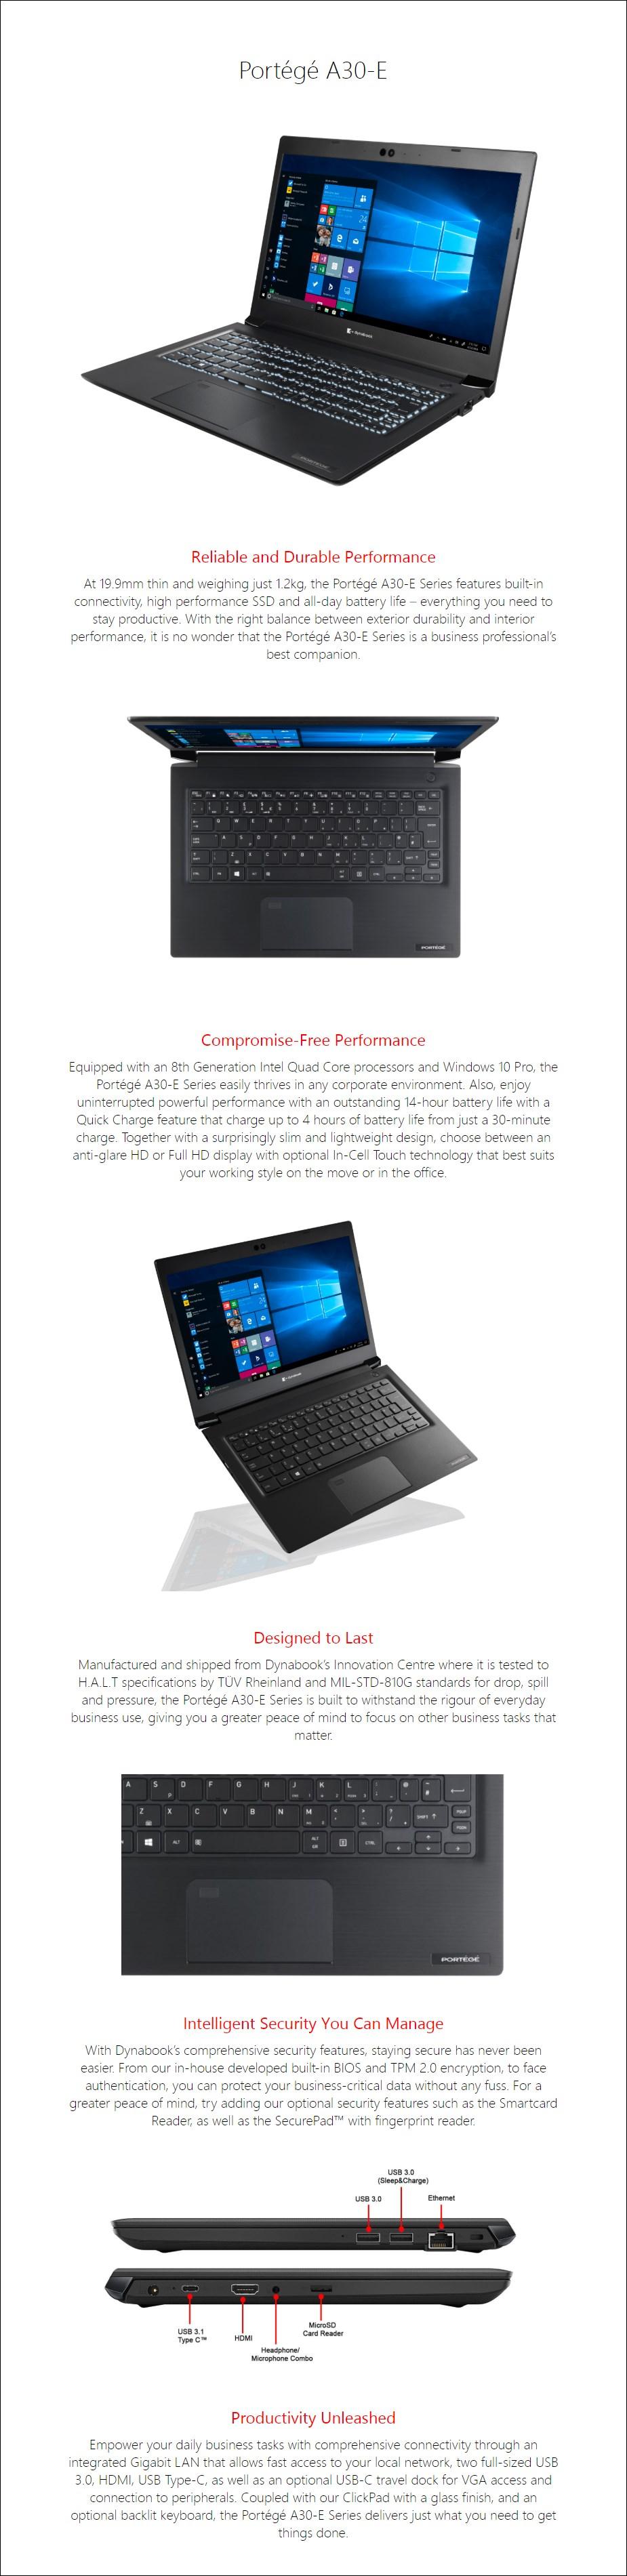 toshiba-dynabook-portege-a30e-133-laptop-i58250u-8gba-256gb-w10p-ac26990-5-1-.jpg